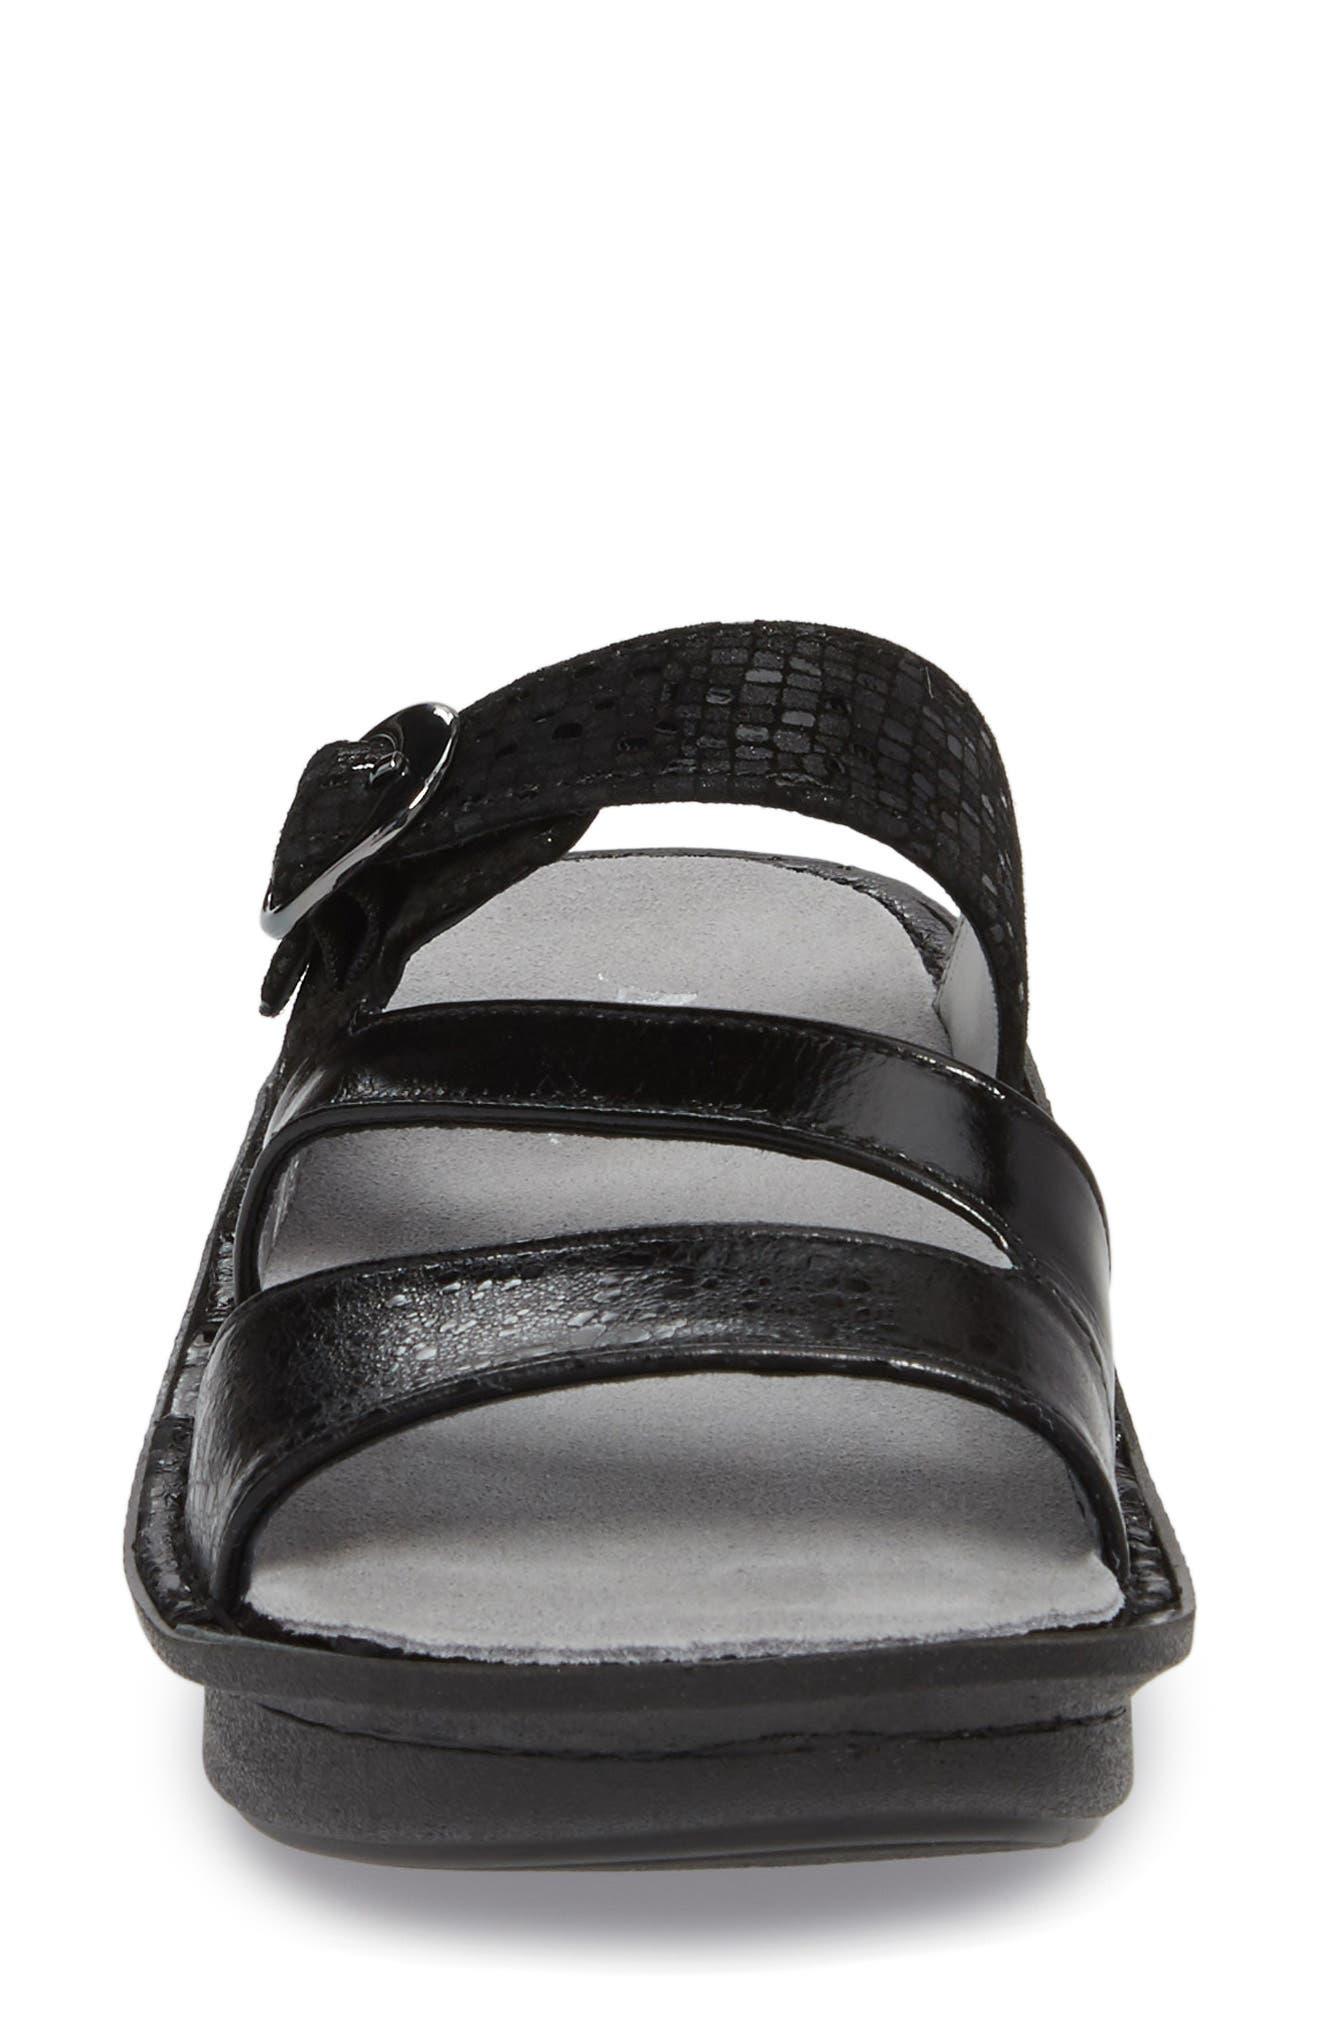 'Colette' Platform Sandal,                             Alternate thumbnail 46, color,